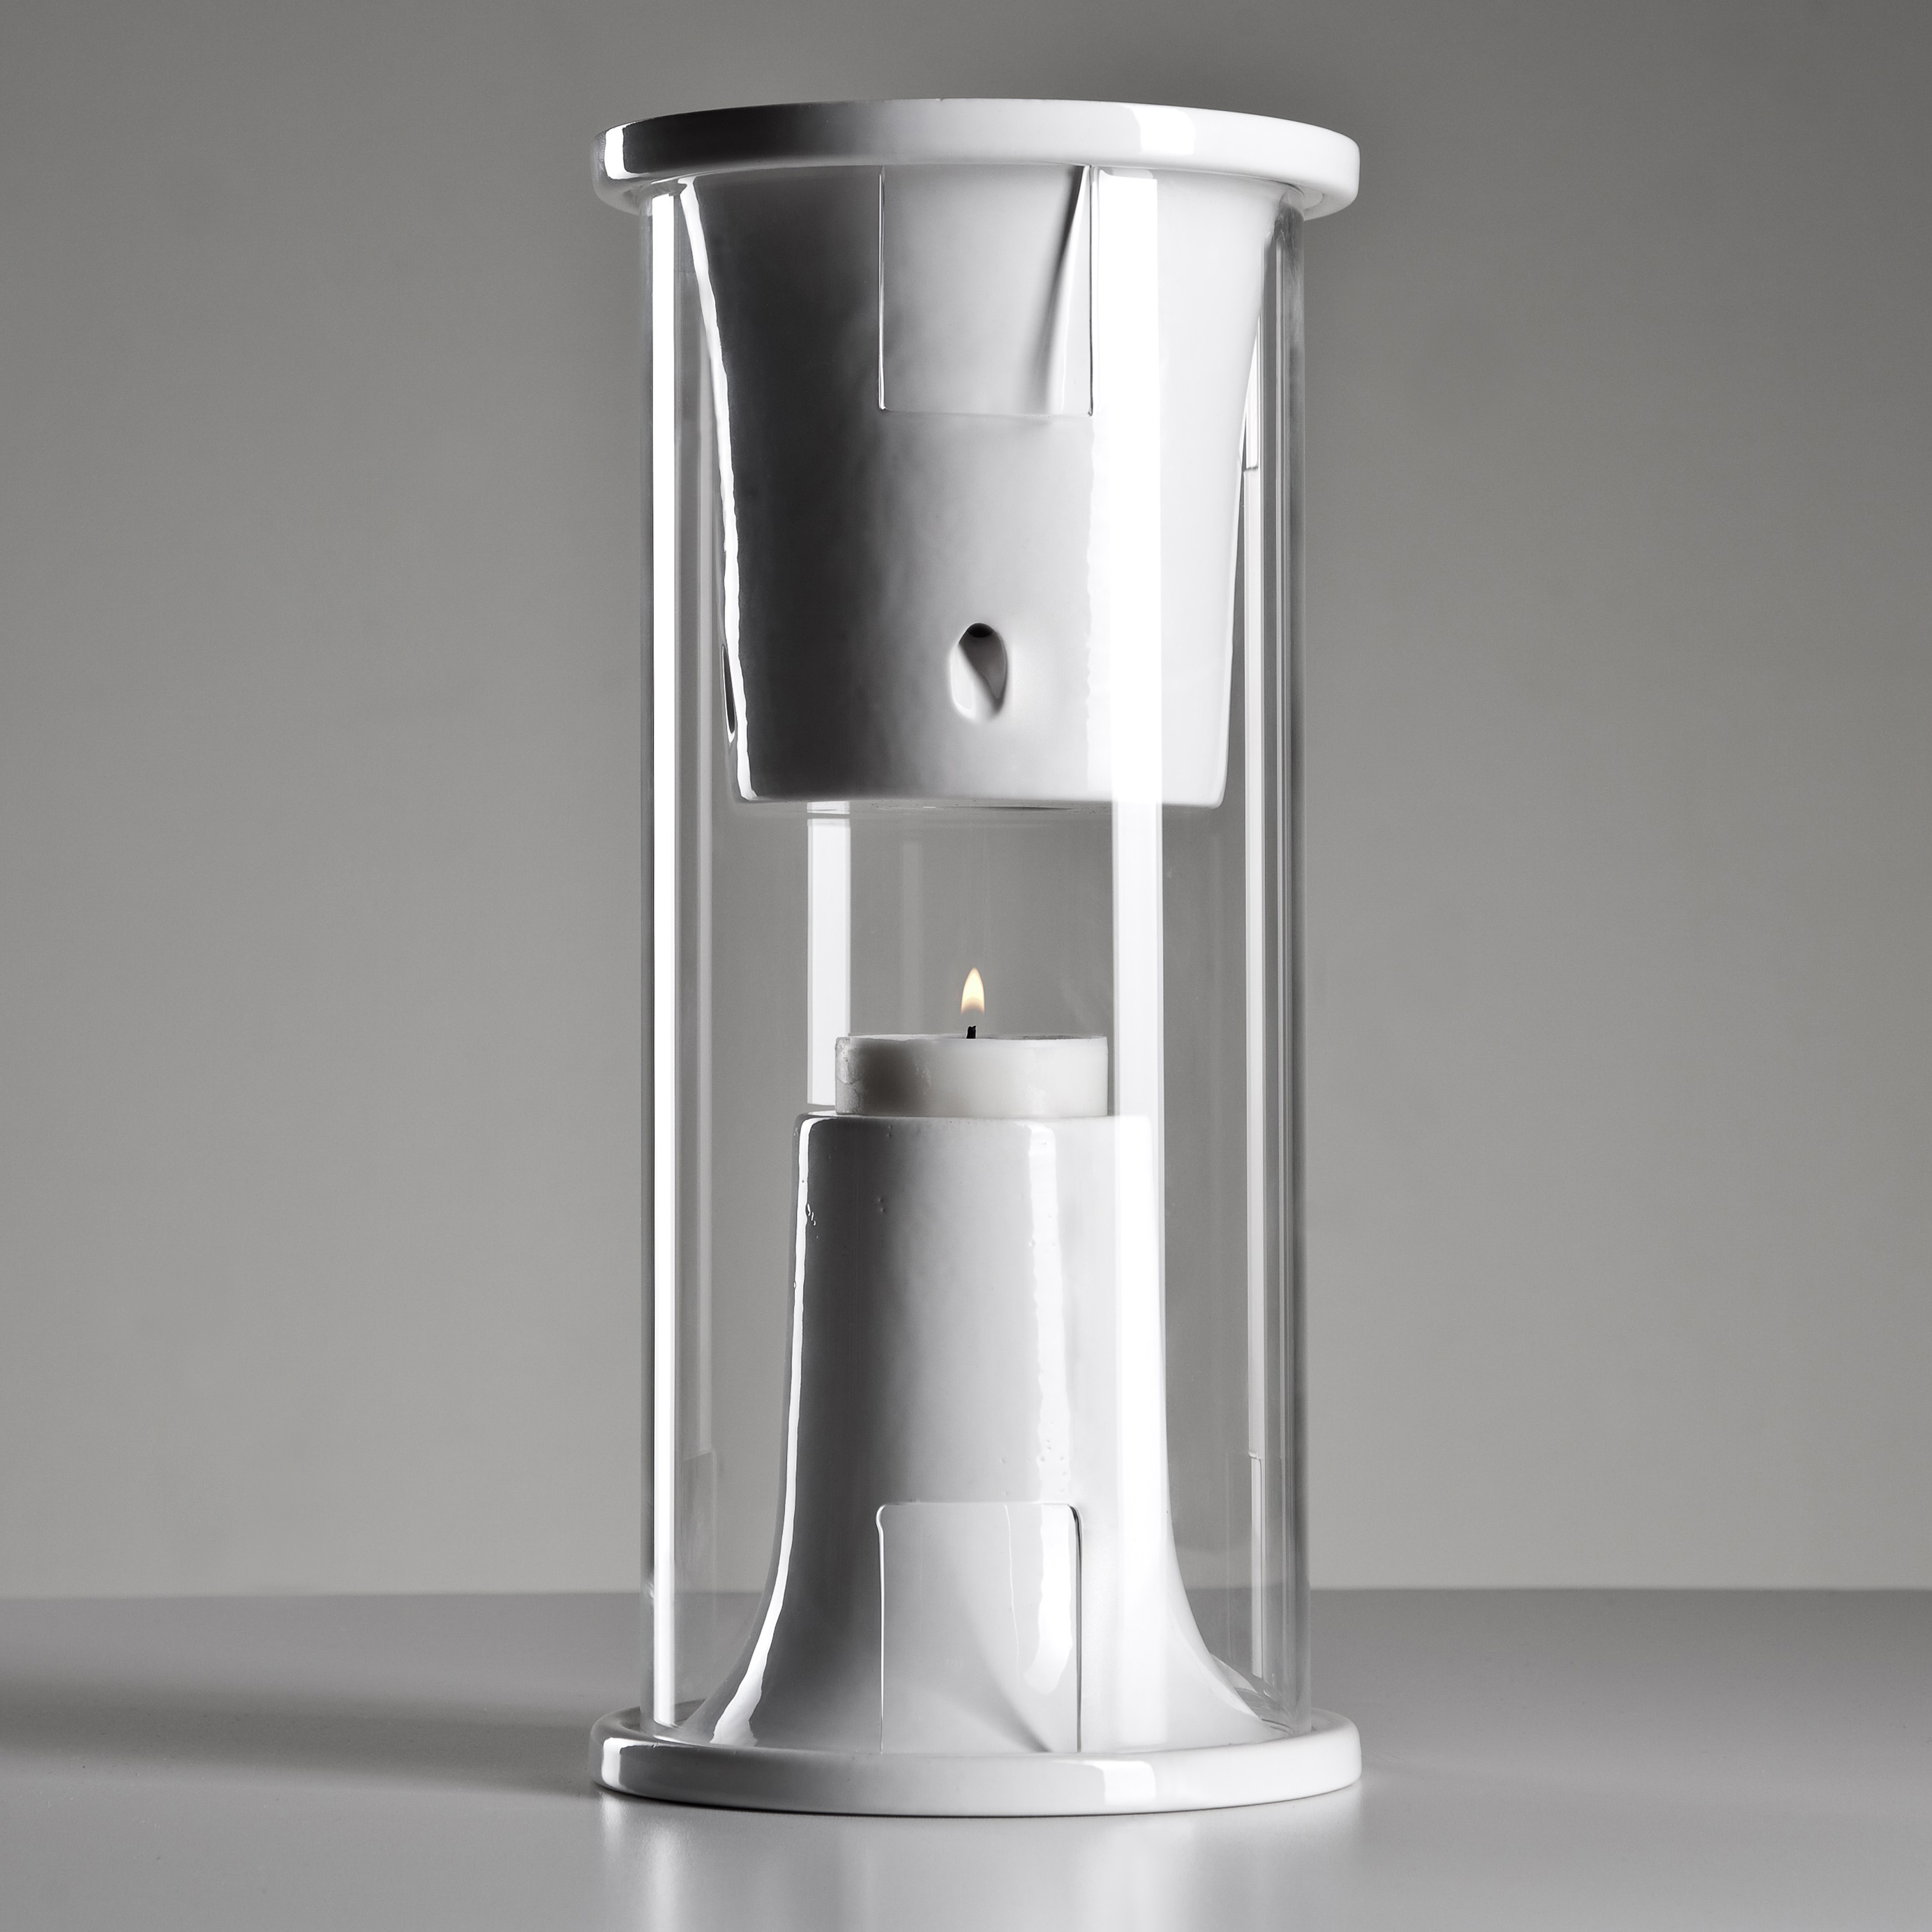 pelty: an unusual audio speaker poweredcandlelight - design milk